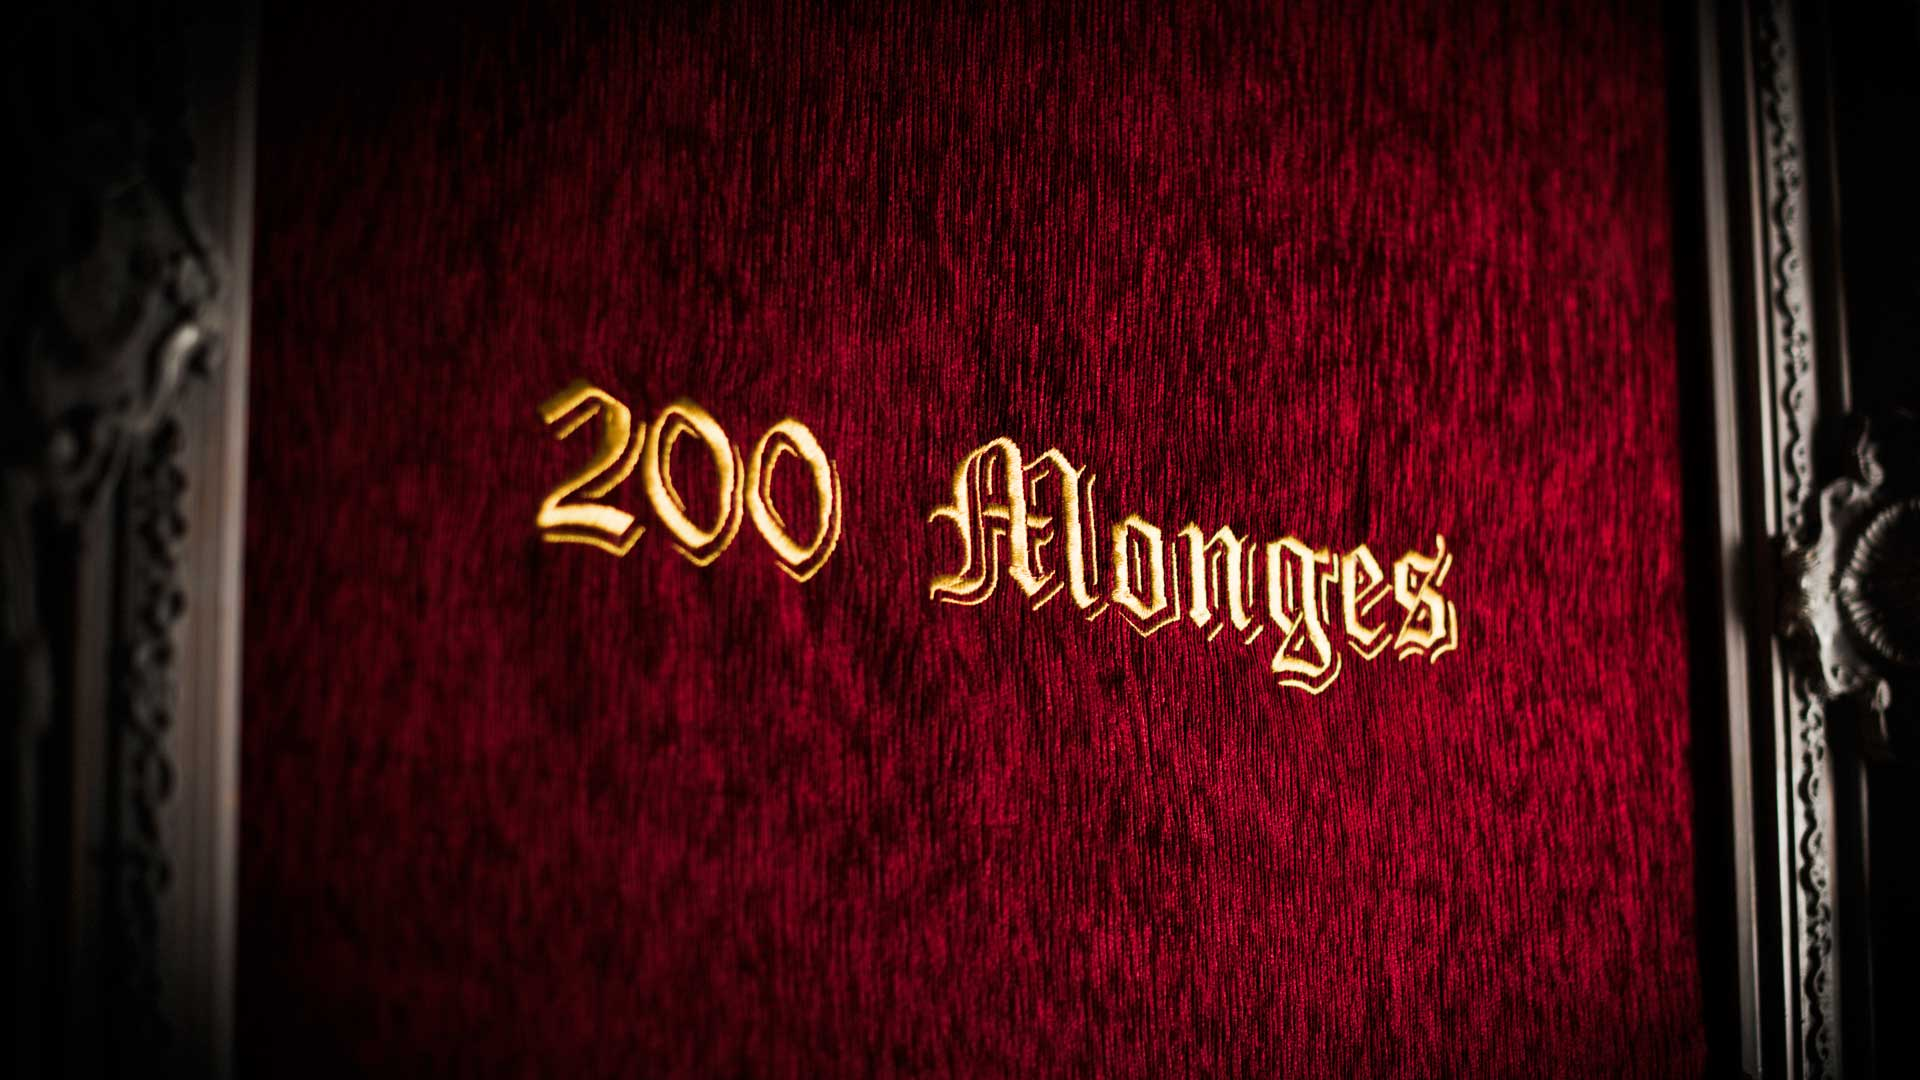 200 Monges